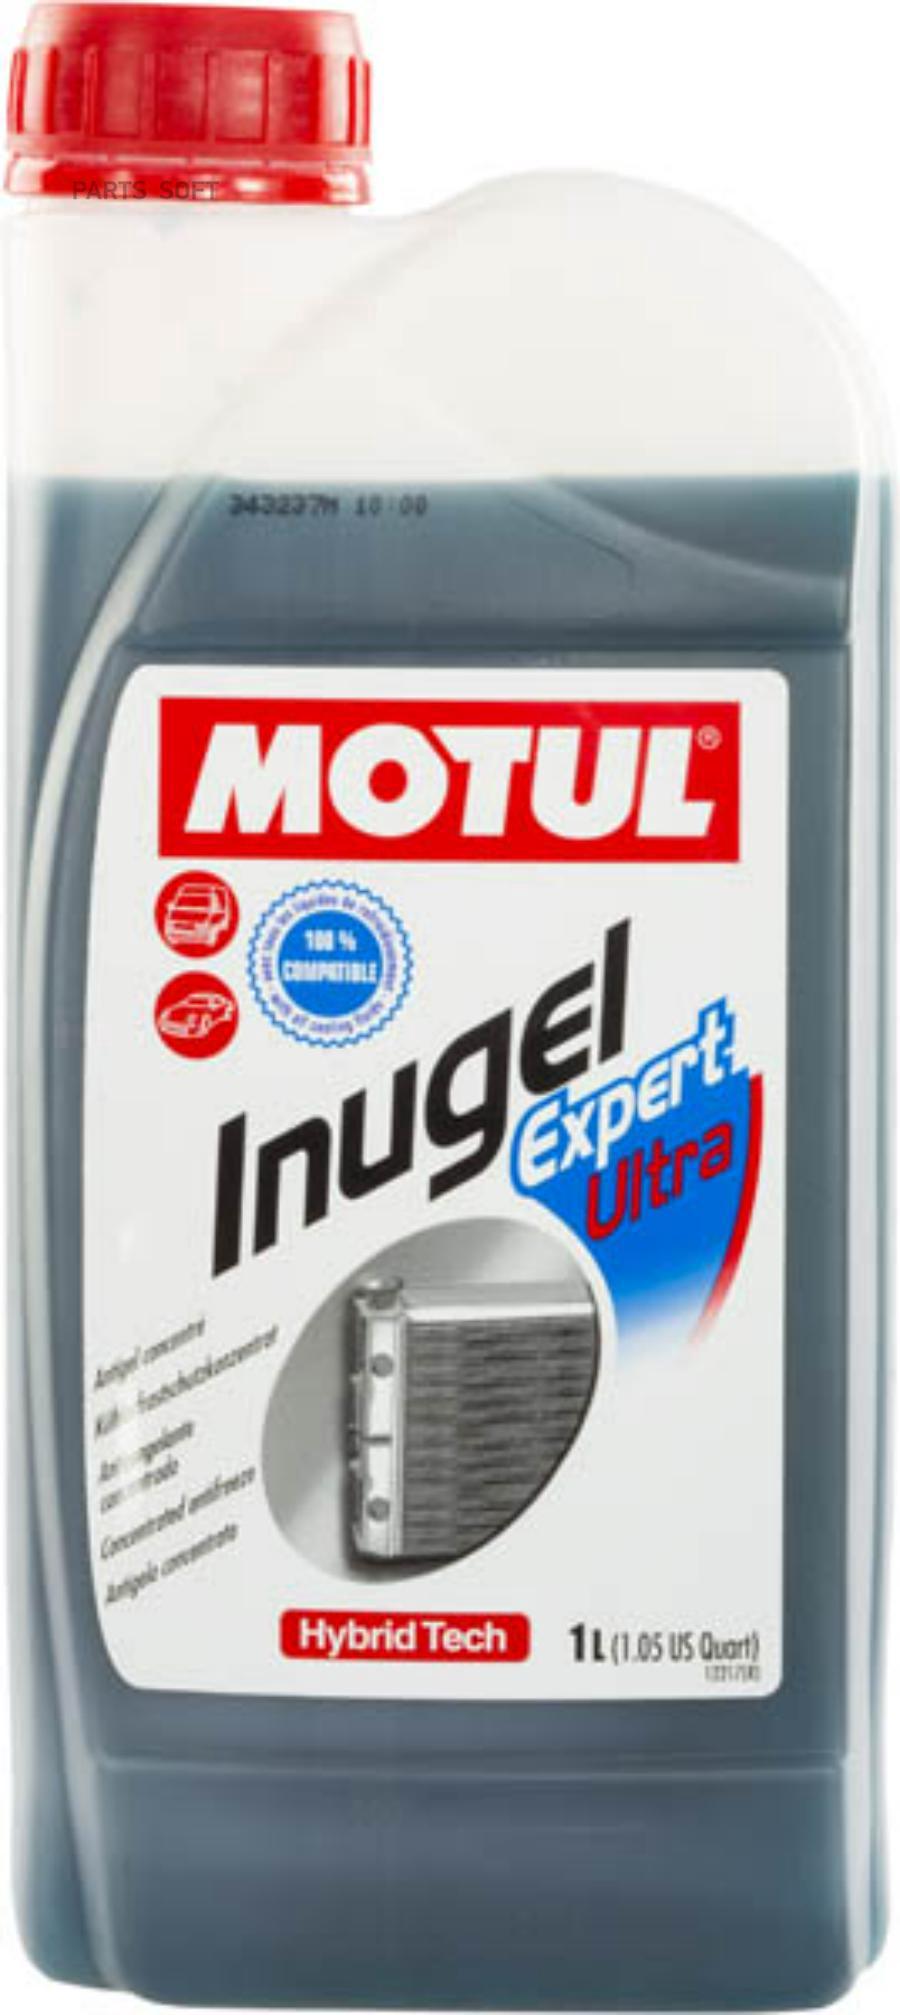 "Антифриз-концентрат ""Inugel Expert Ultra"", 1л"